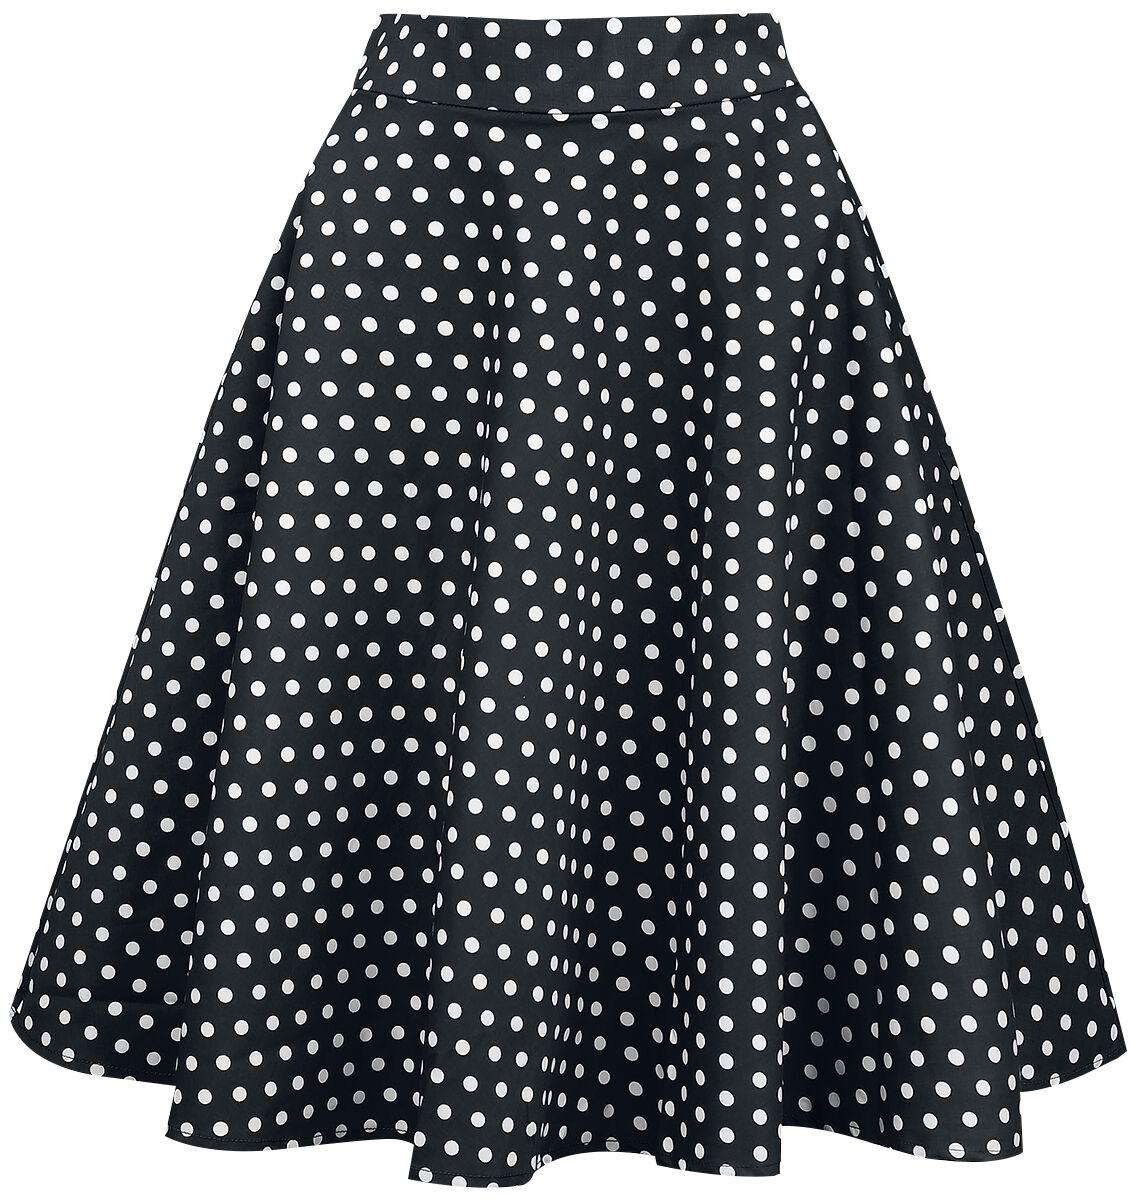 Roecke für Frauen - Dolly and Dotty Shirley High Waist Full Circle Polka Dot Skirt Rock schwarz weiß  - Onlineshop EMP